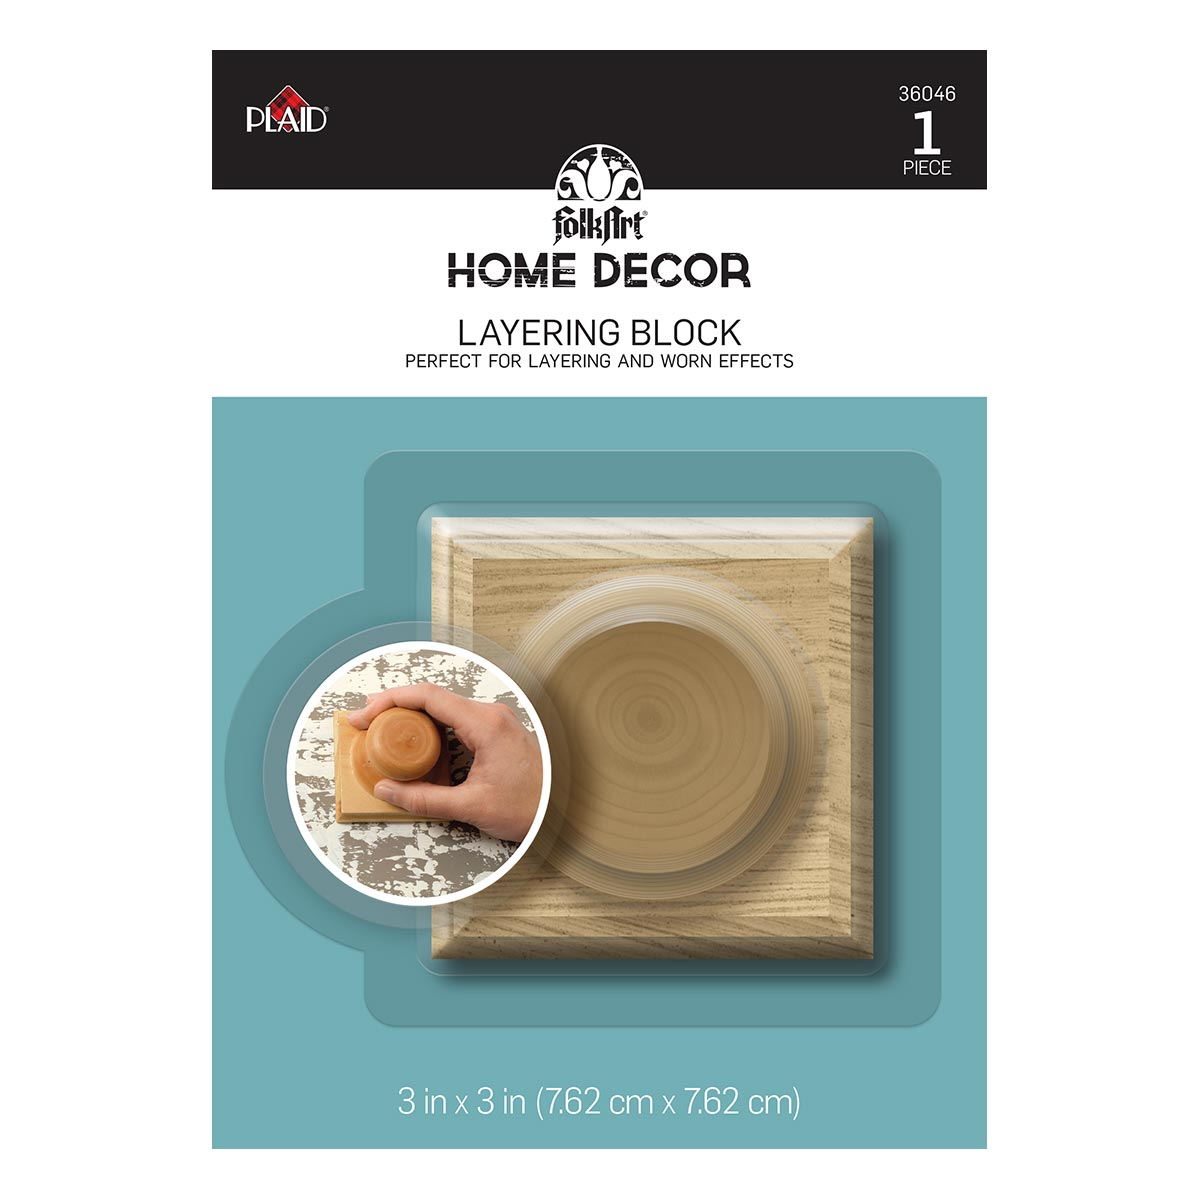 FolkArt ® Home Decor™ Tools - Layering Block